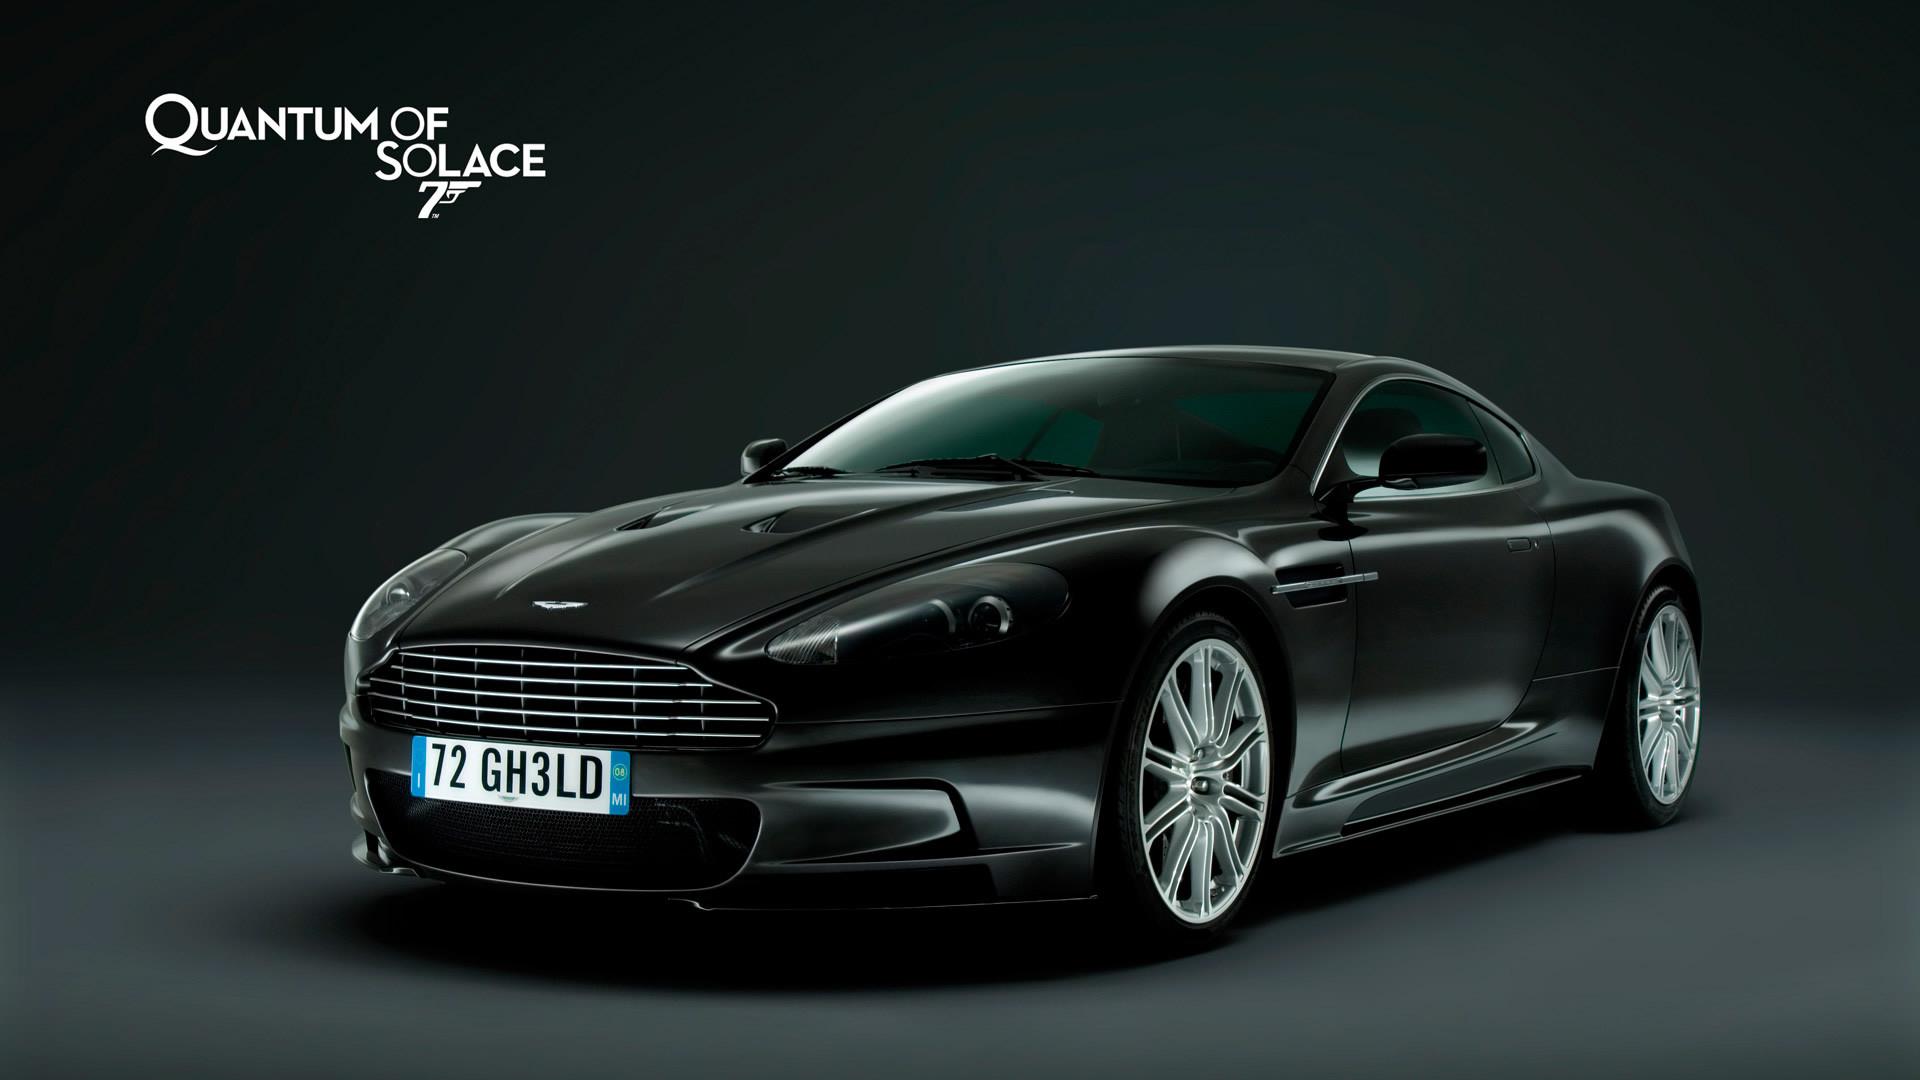 James Bond Wallpaper (78+ Images